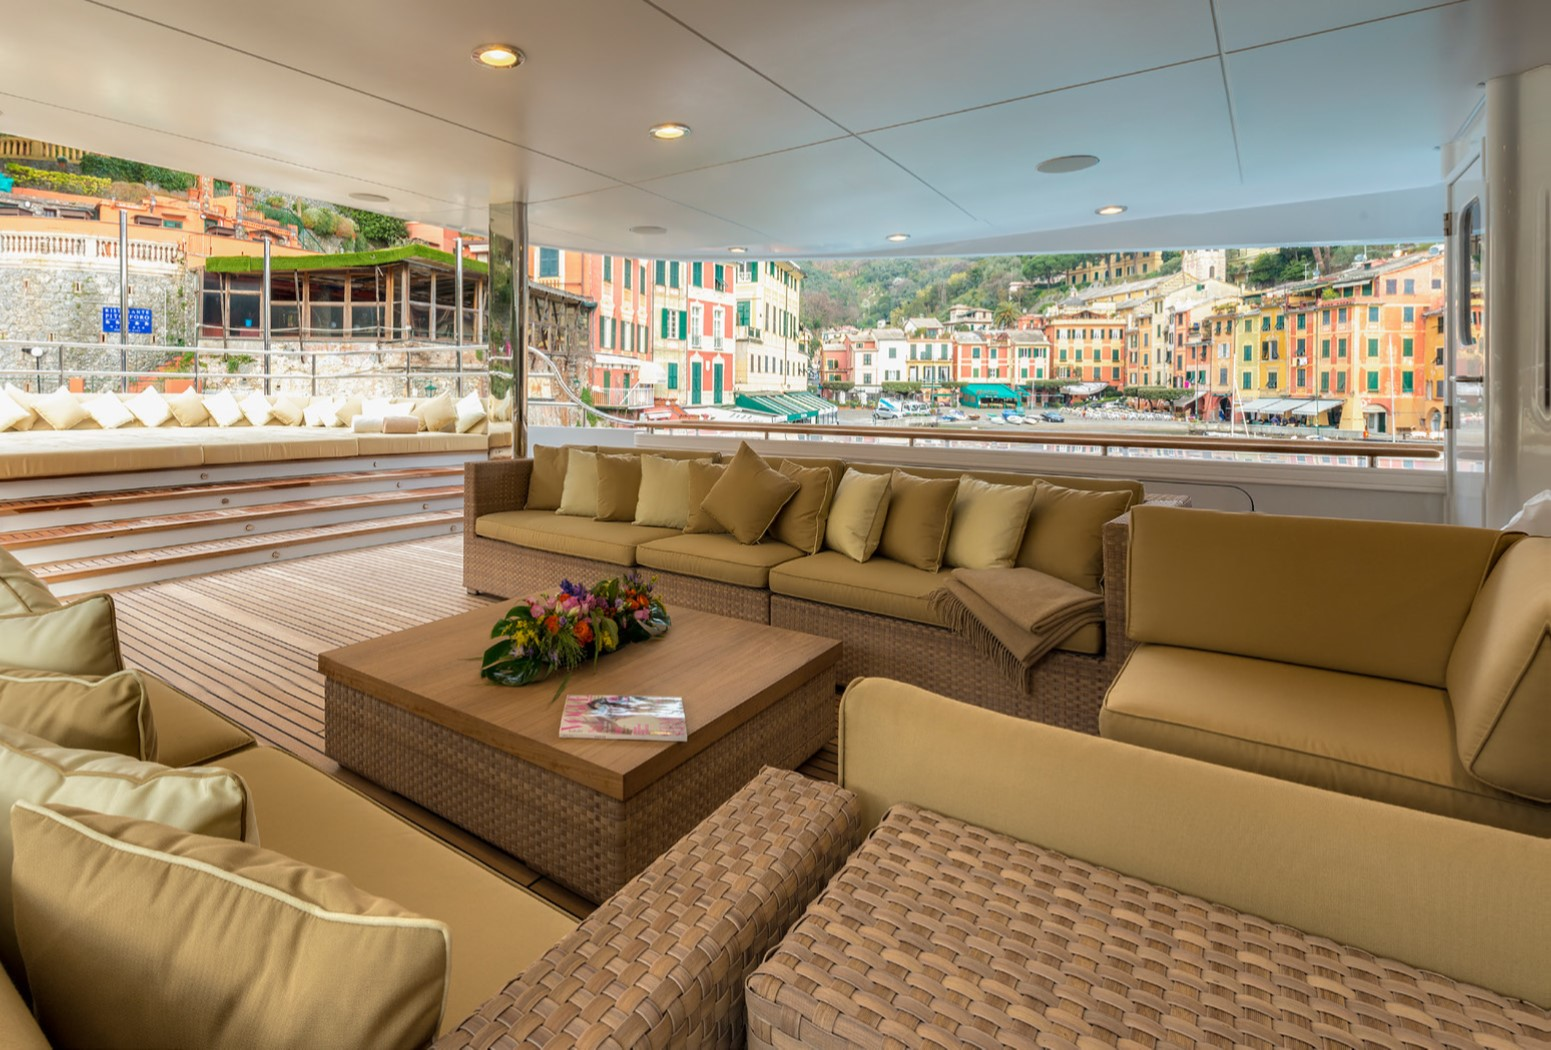 Upper Deck Aft Seating - Portofino In Italy